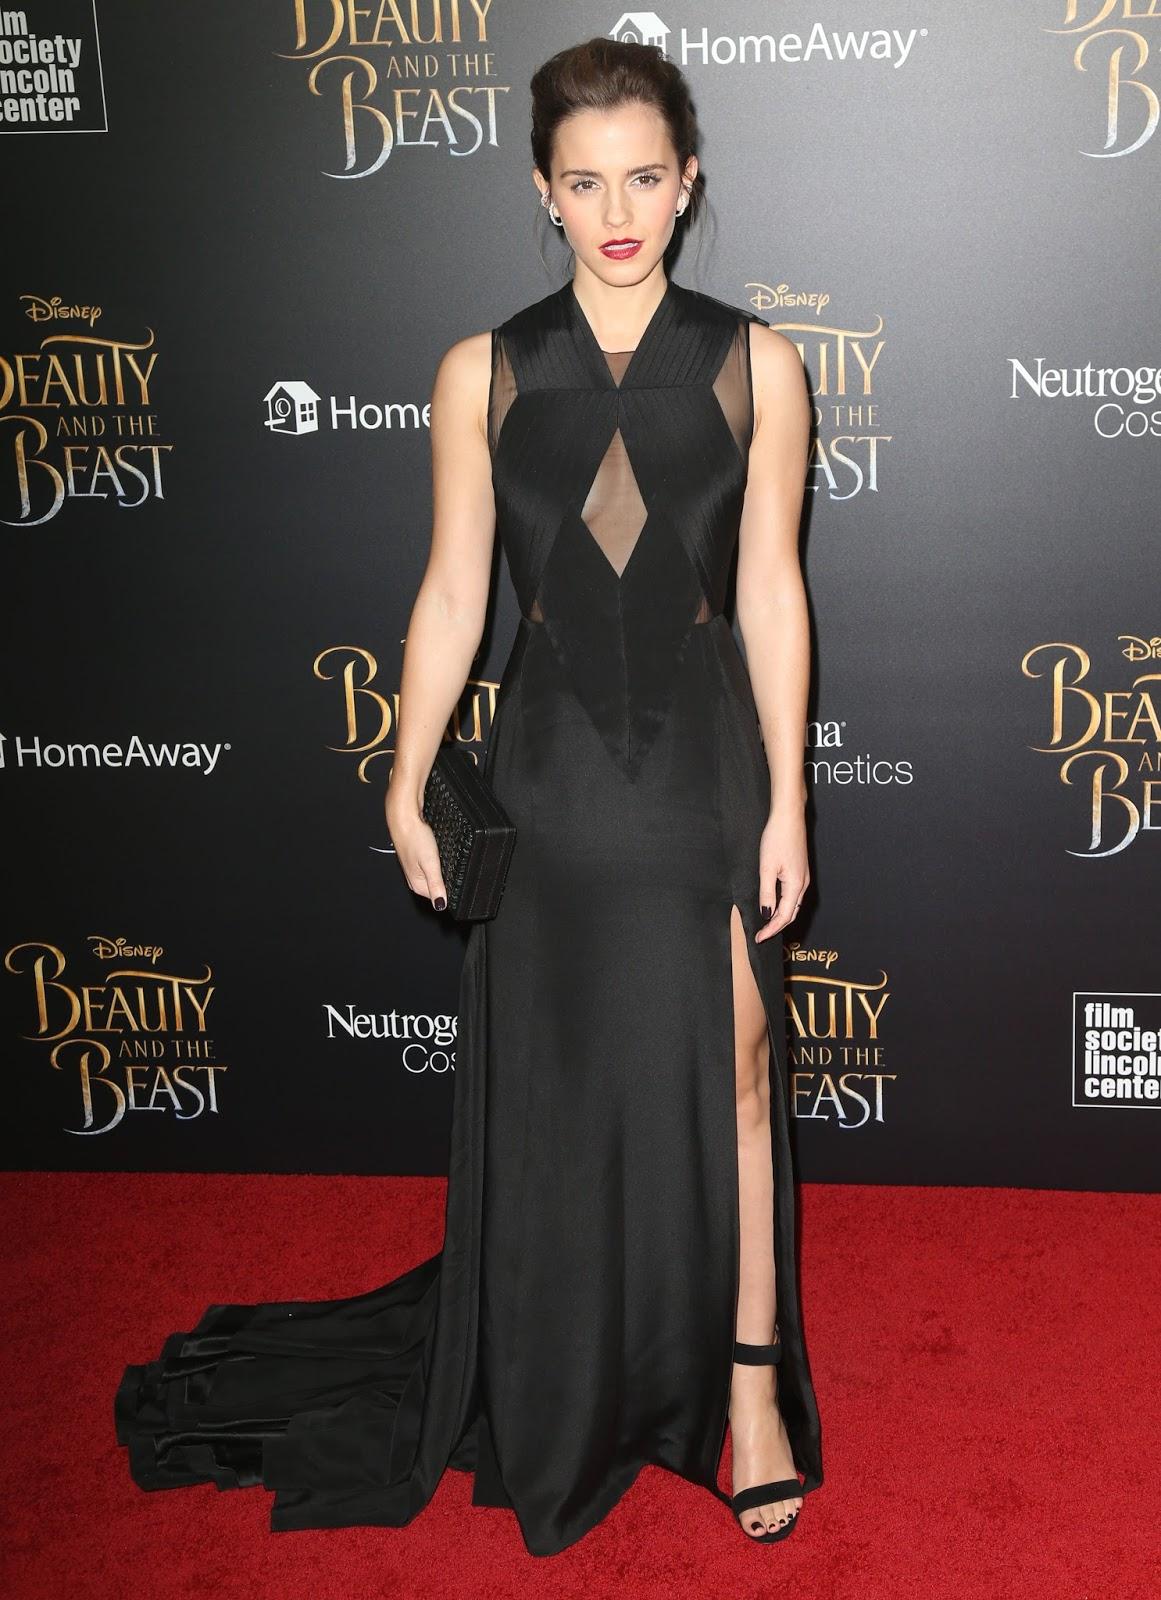 Emma Watson Red Carpet Fashion Emmawatson Meeko Spark Tv